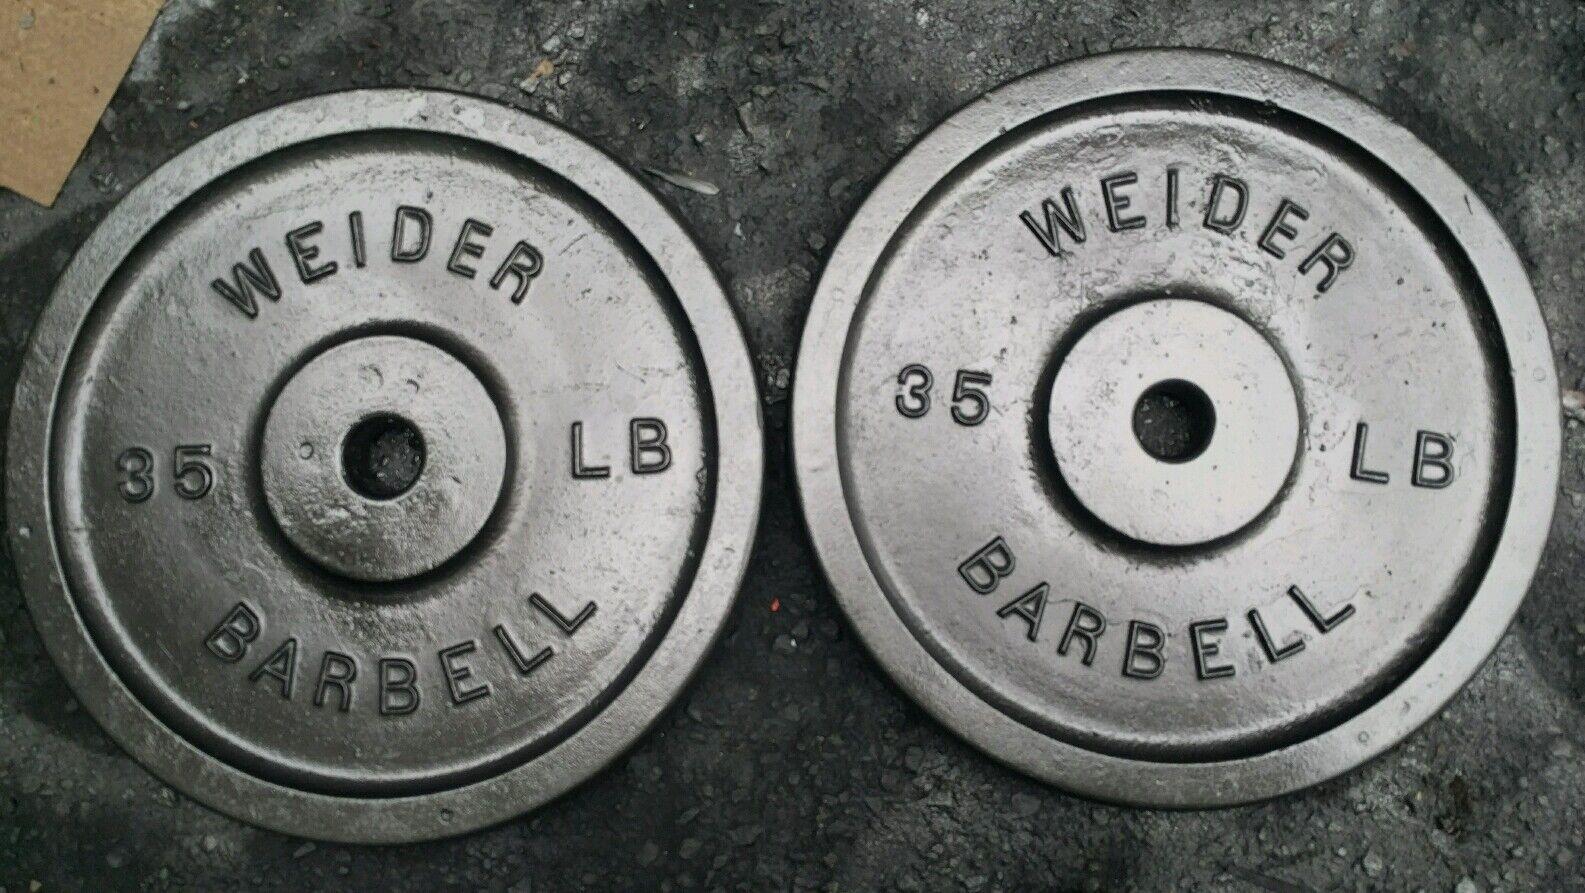 Vintage Pair Weider 35 lb lb lb Weight Plates 2x35 pounds Hard To Find Größe Standard 2bfade